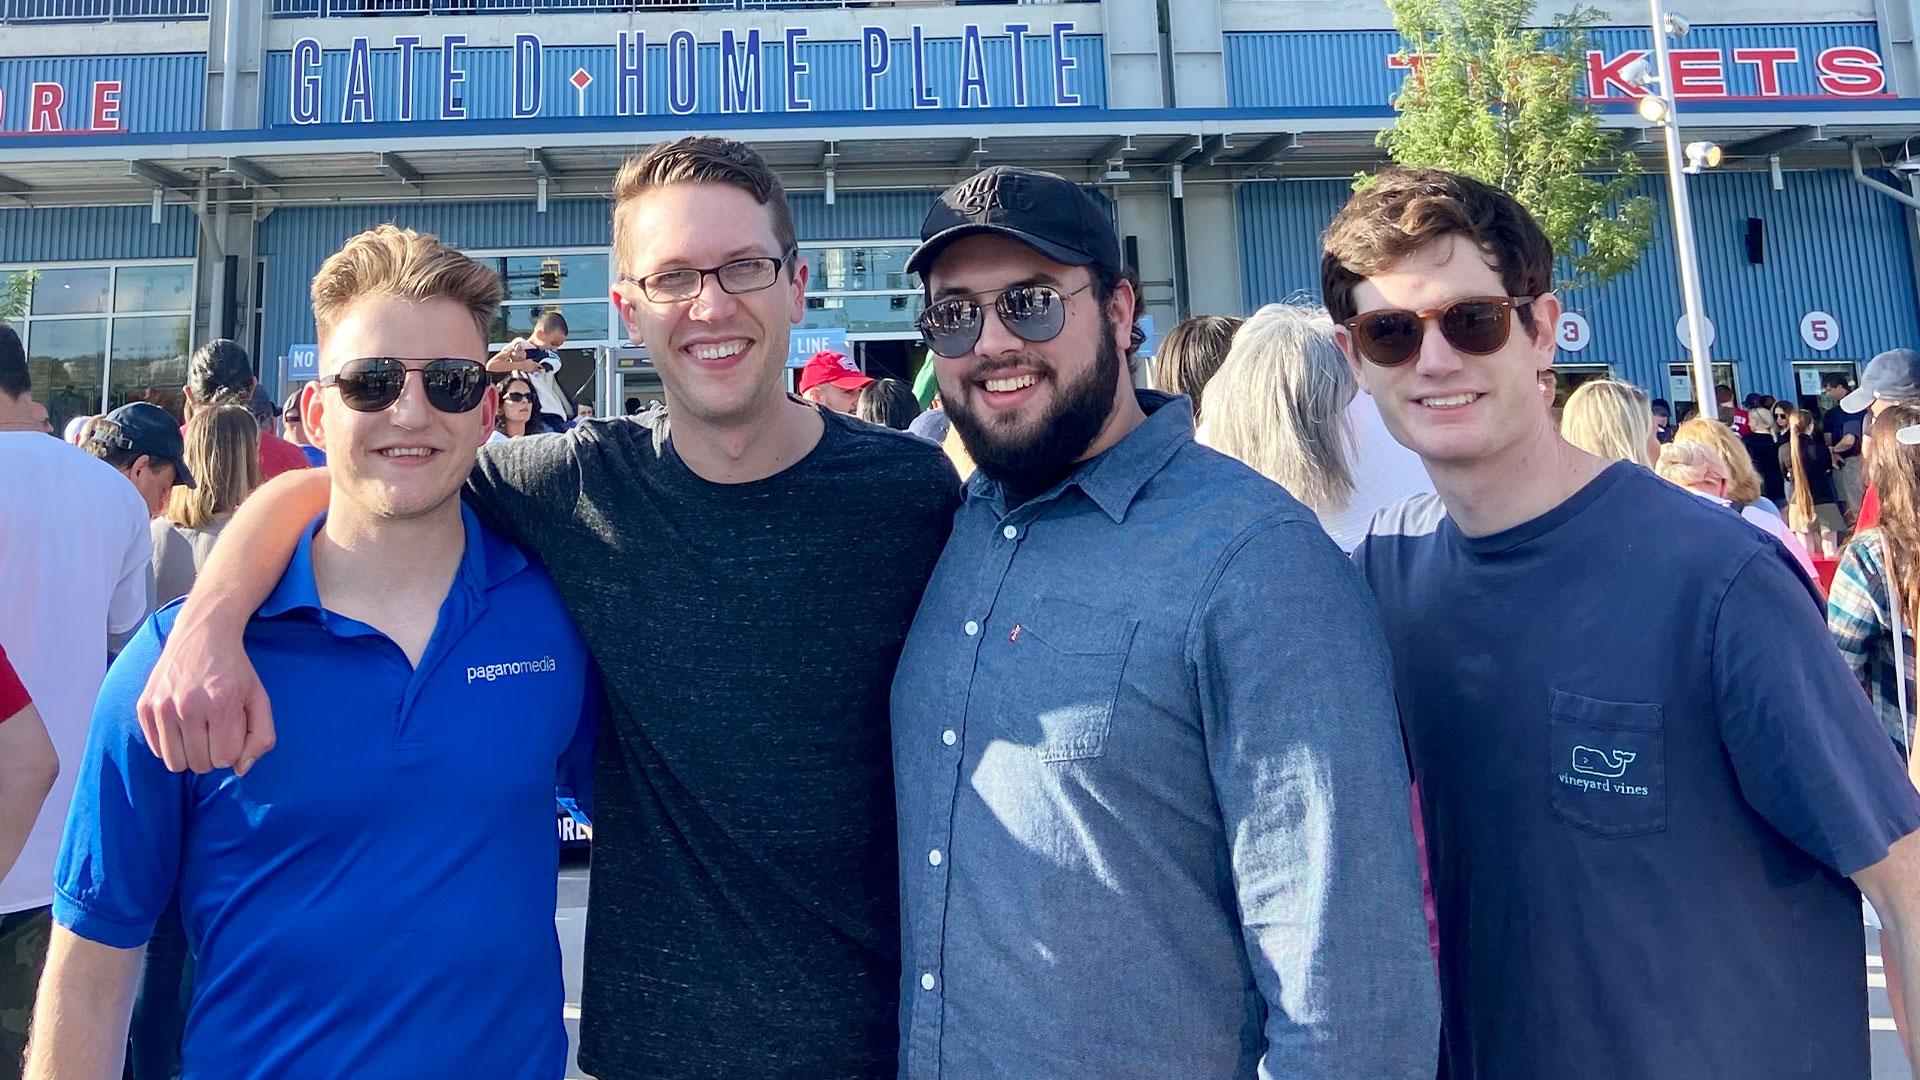 pagano media careers team outing woosox